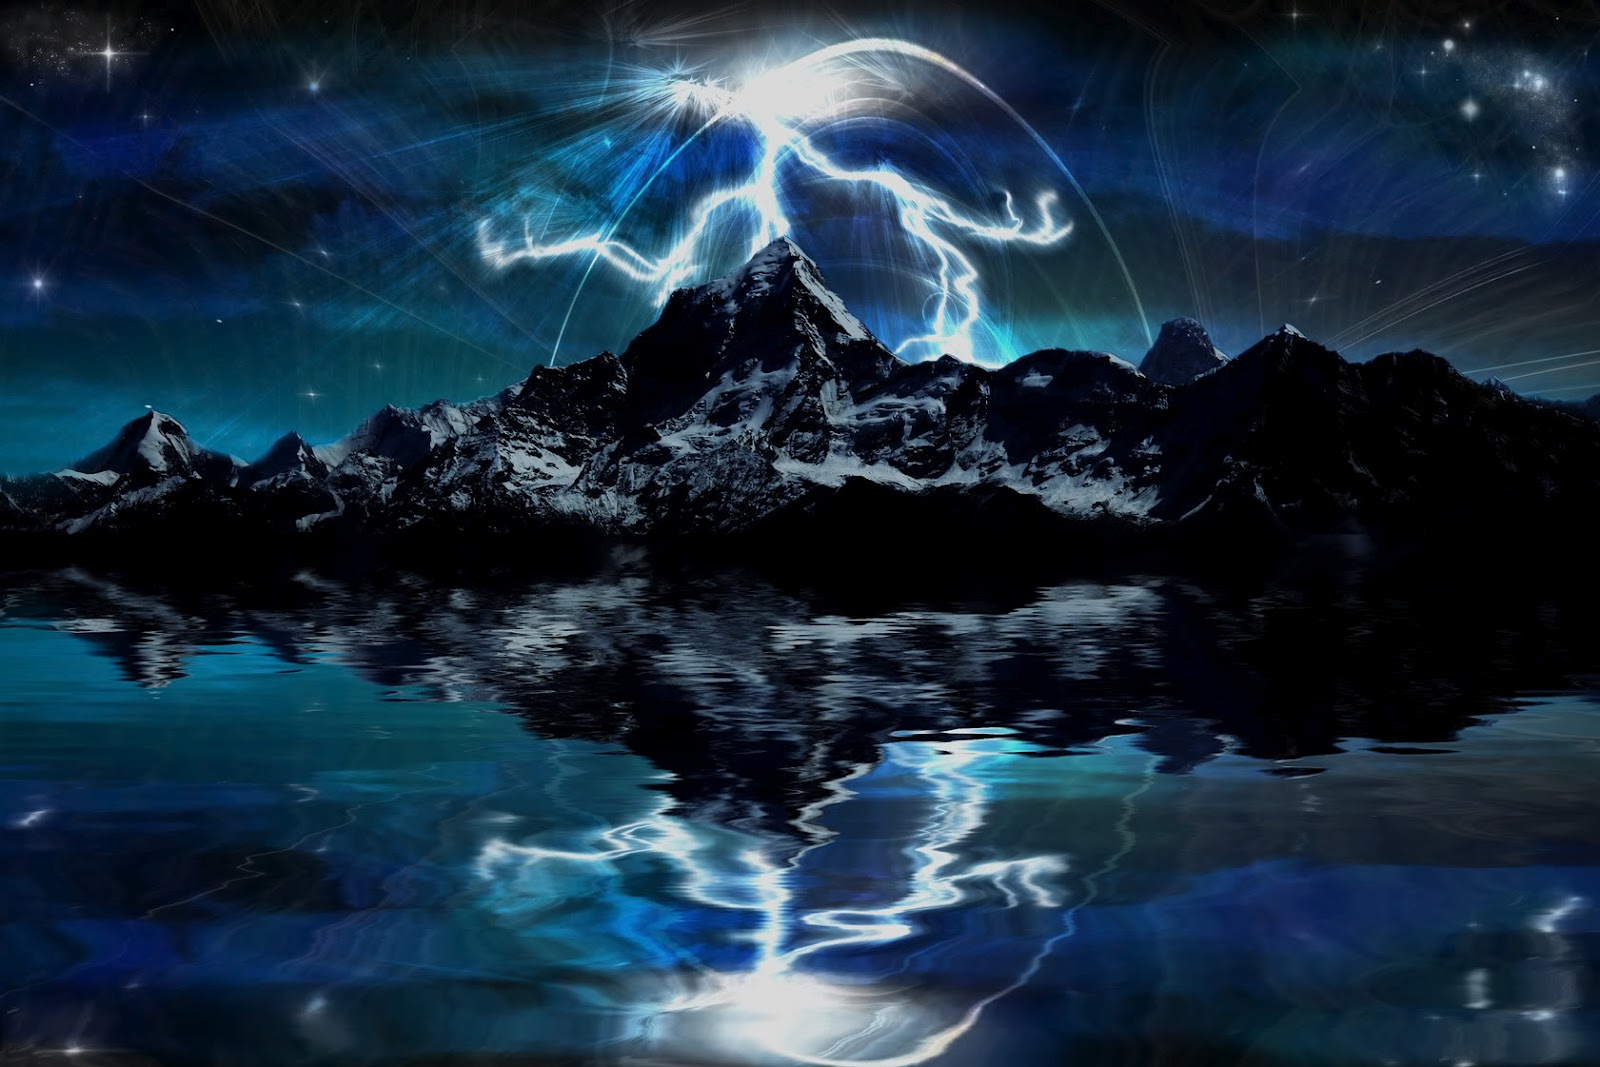 http://4.bp.blogspot.com/-JBmknhF-9JA/UAtzjJirglI/AAAAAAAAABY/9PFeQ7YiL0s/s1600/twilightofthethundergod.jpg